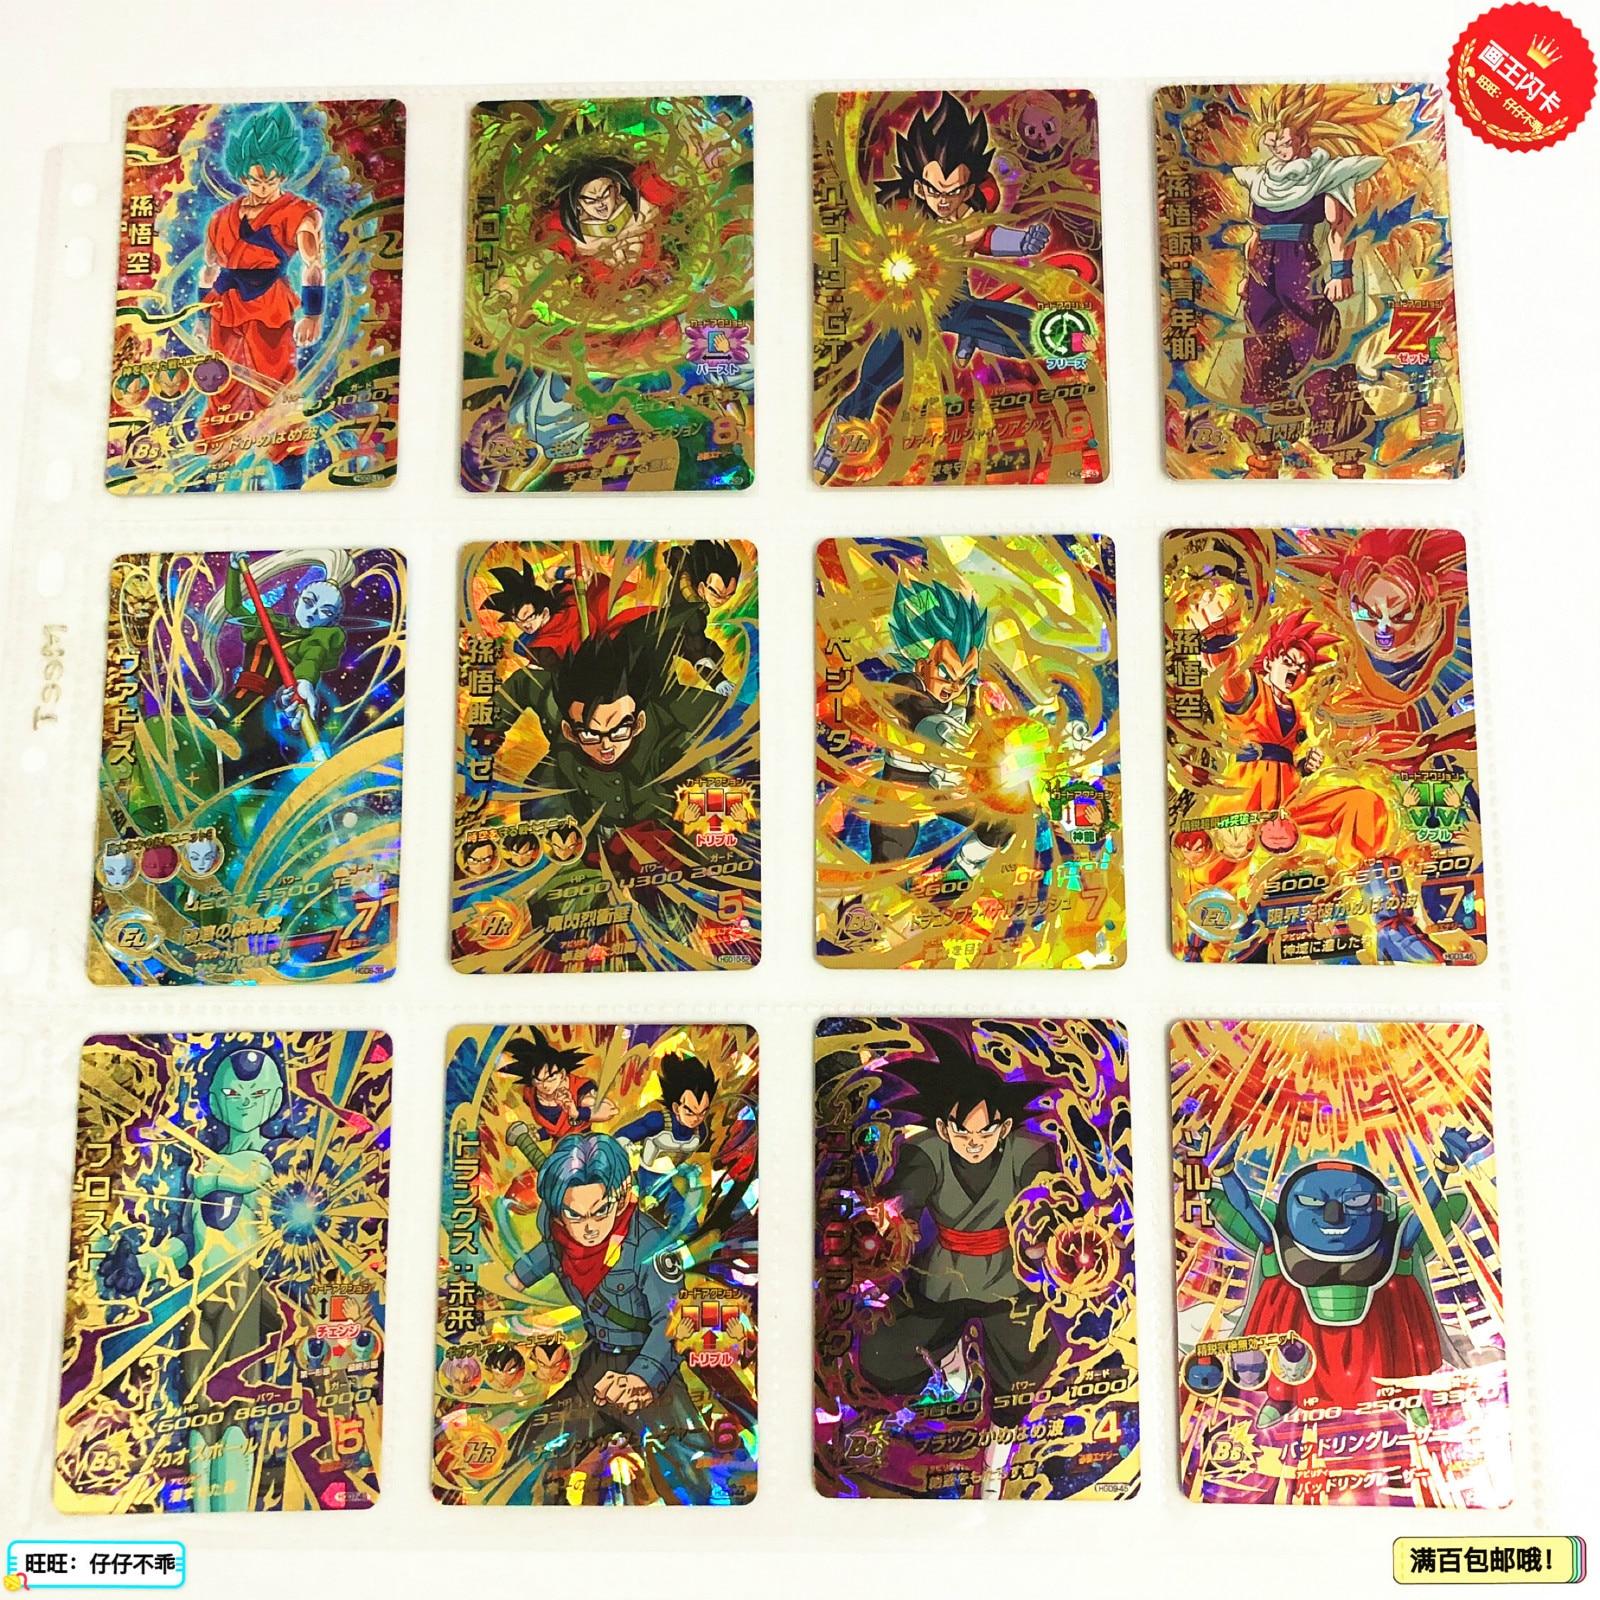 Japan Original Dragon Ball Hero Card 4 stars UR HGD Goku Toys Hobbies Collectibles Game Collection Anime Cards